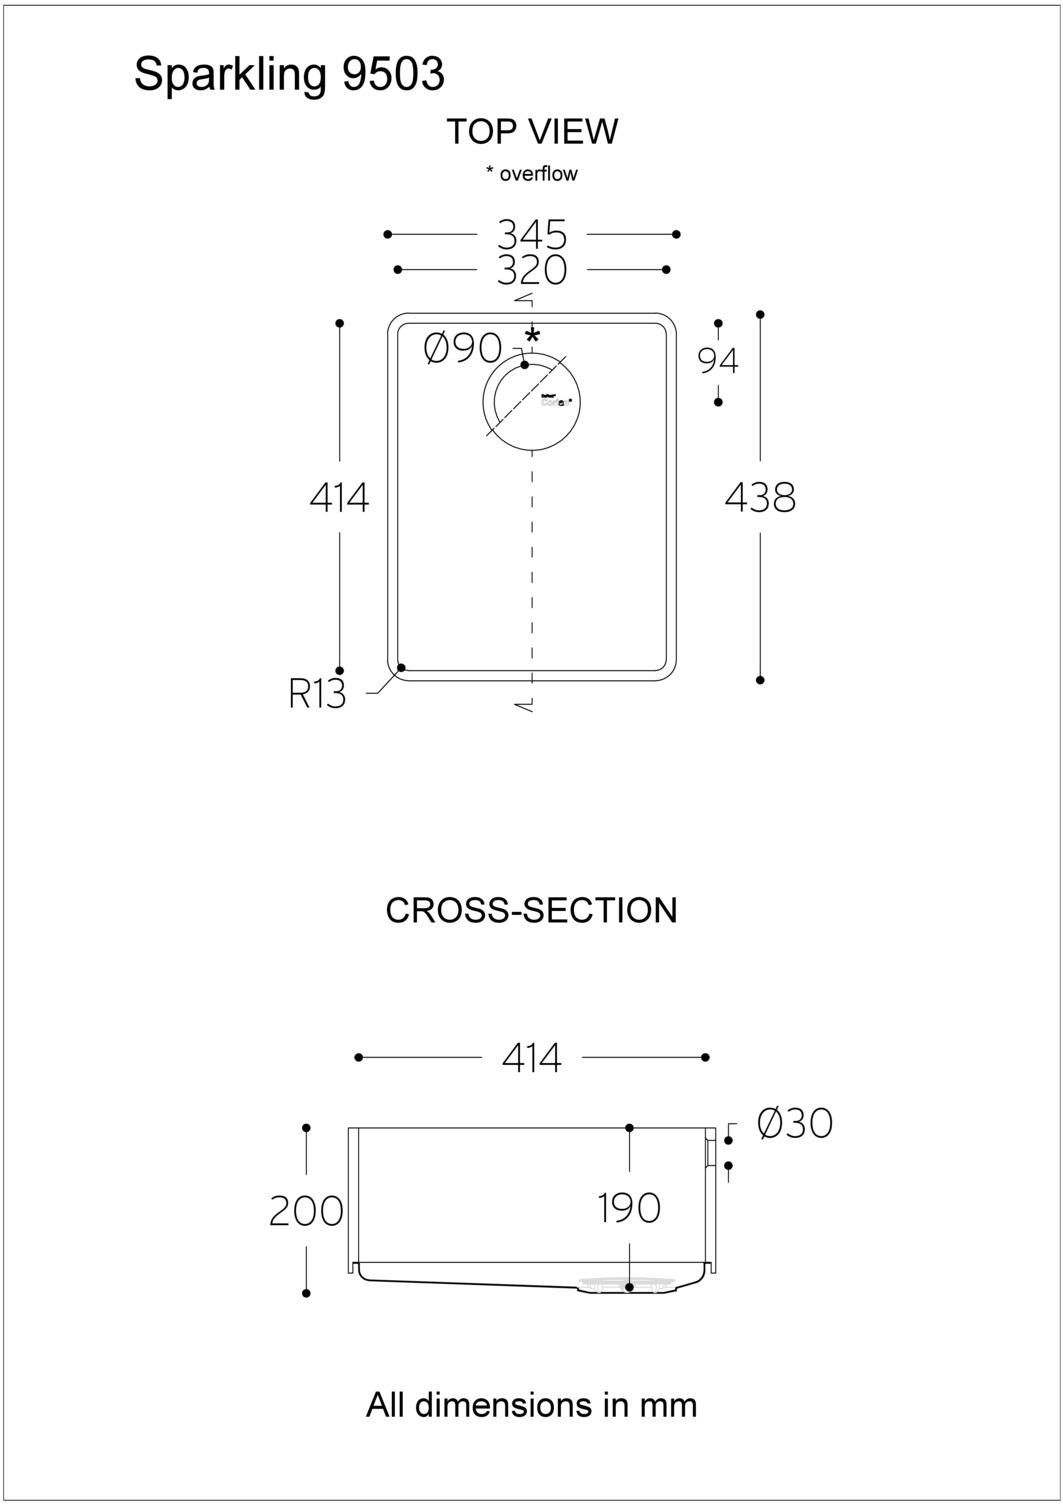 DUPONT_CORIAN_SPARKLING9503_2D_PDF[0]